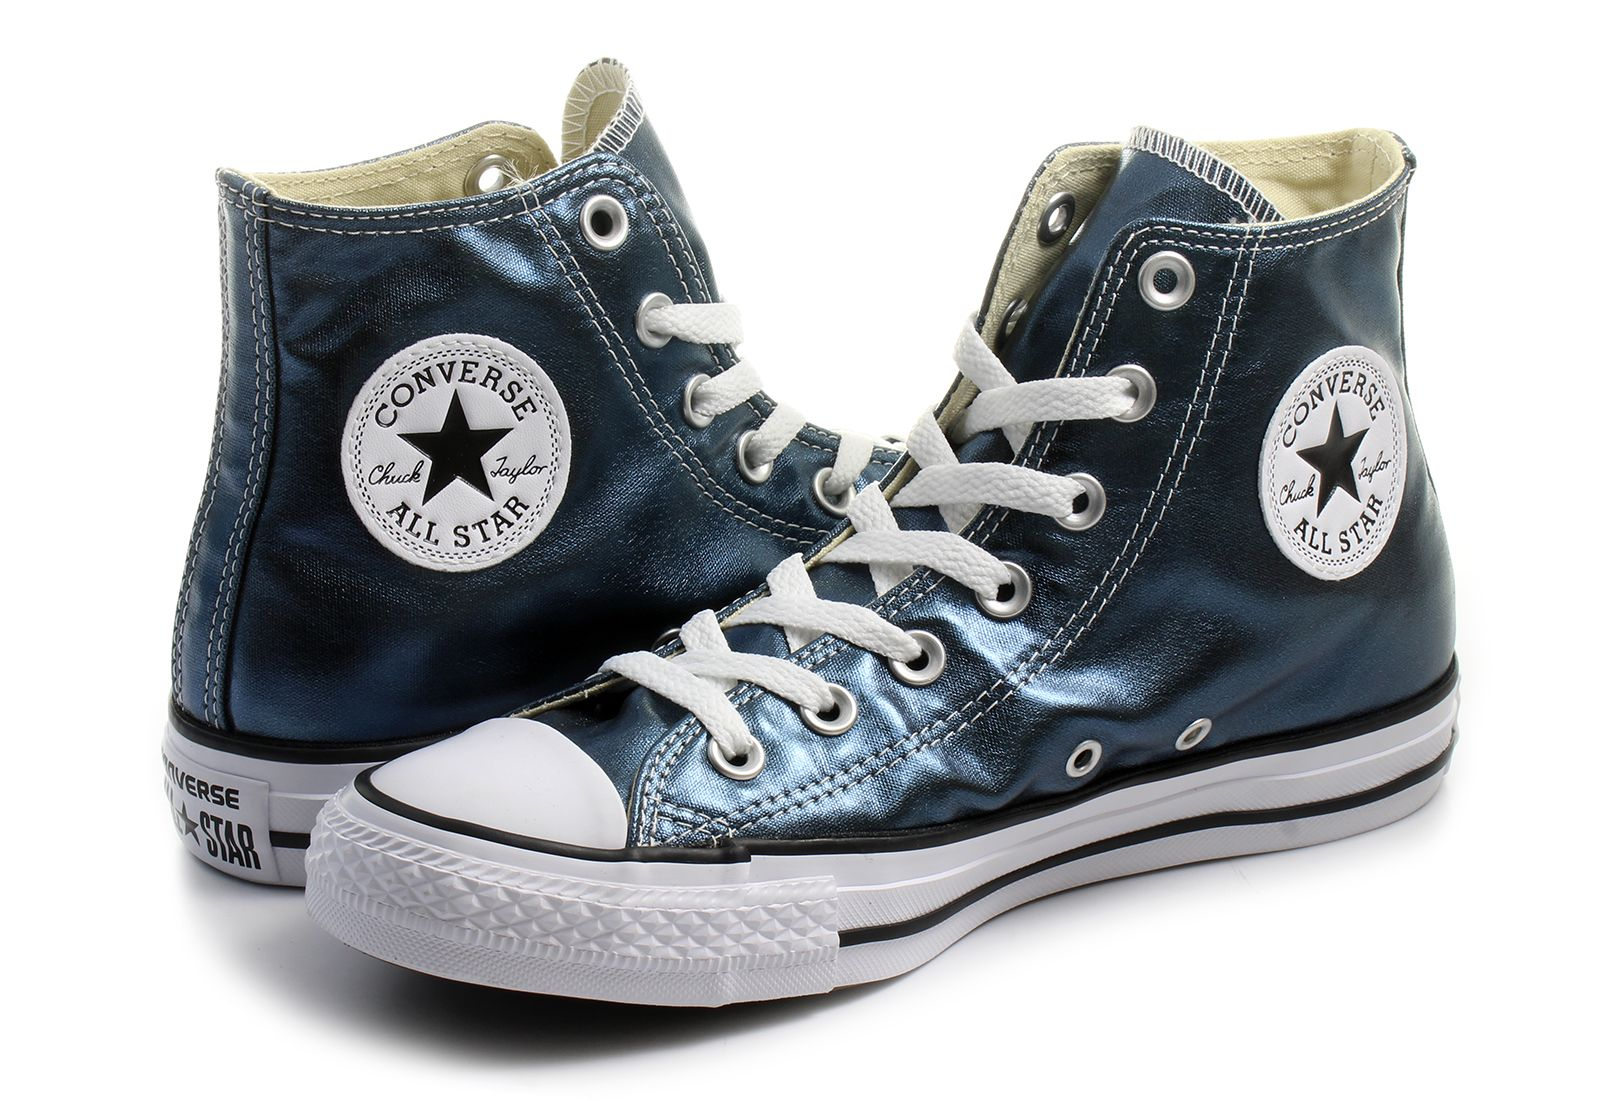 Converse Tenisky - Chuck Taylor All Star Metallic Canvas ... 1a1a9141b4